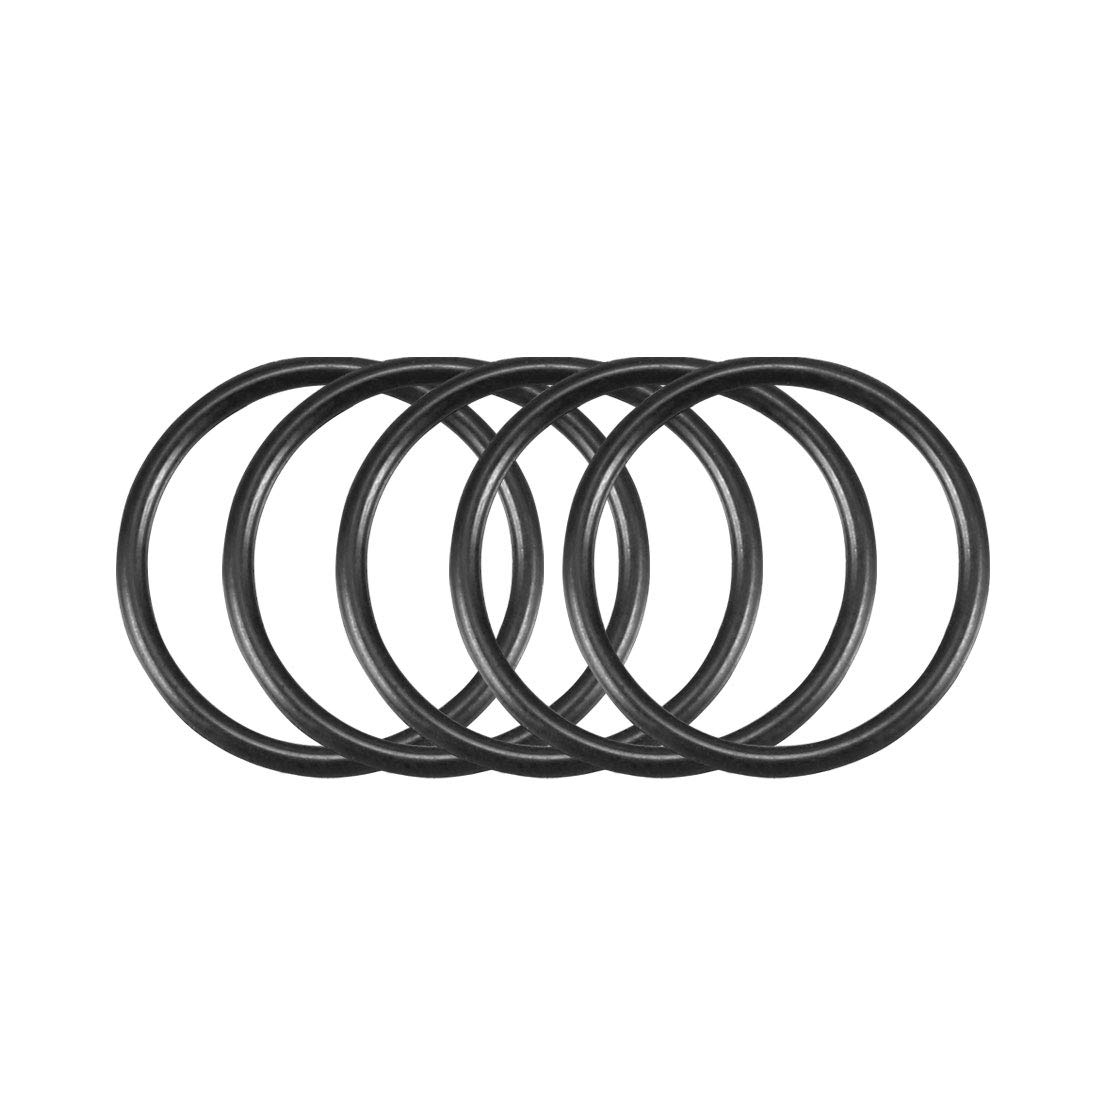 13mm OD 11mm ID 1mm Width Pack of 50 Metric Buna-N Sealing Gasket uxcell Nitrile Rubber O-Rings